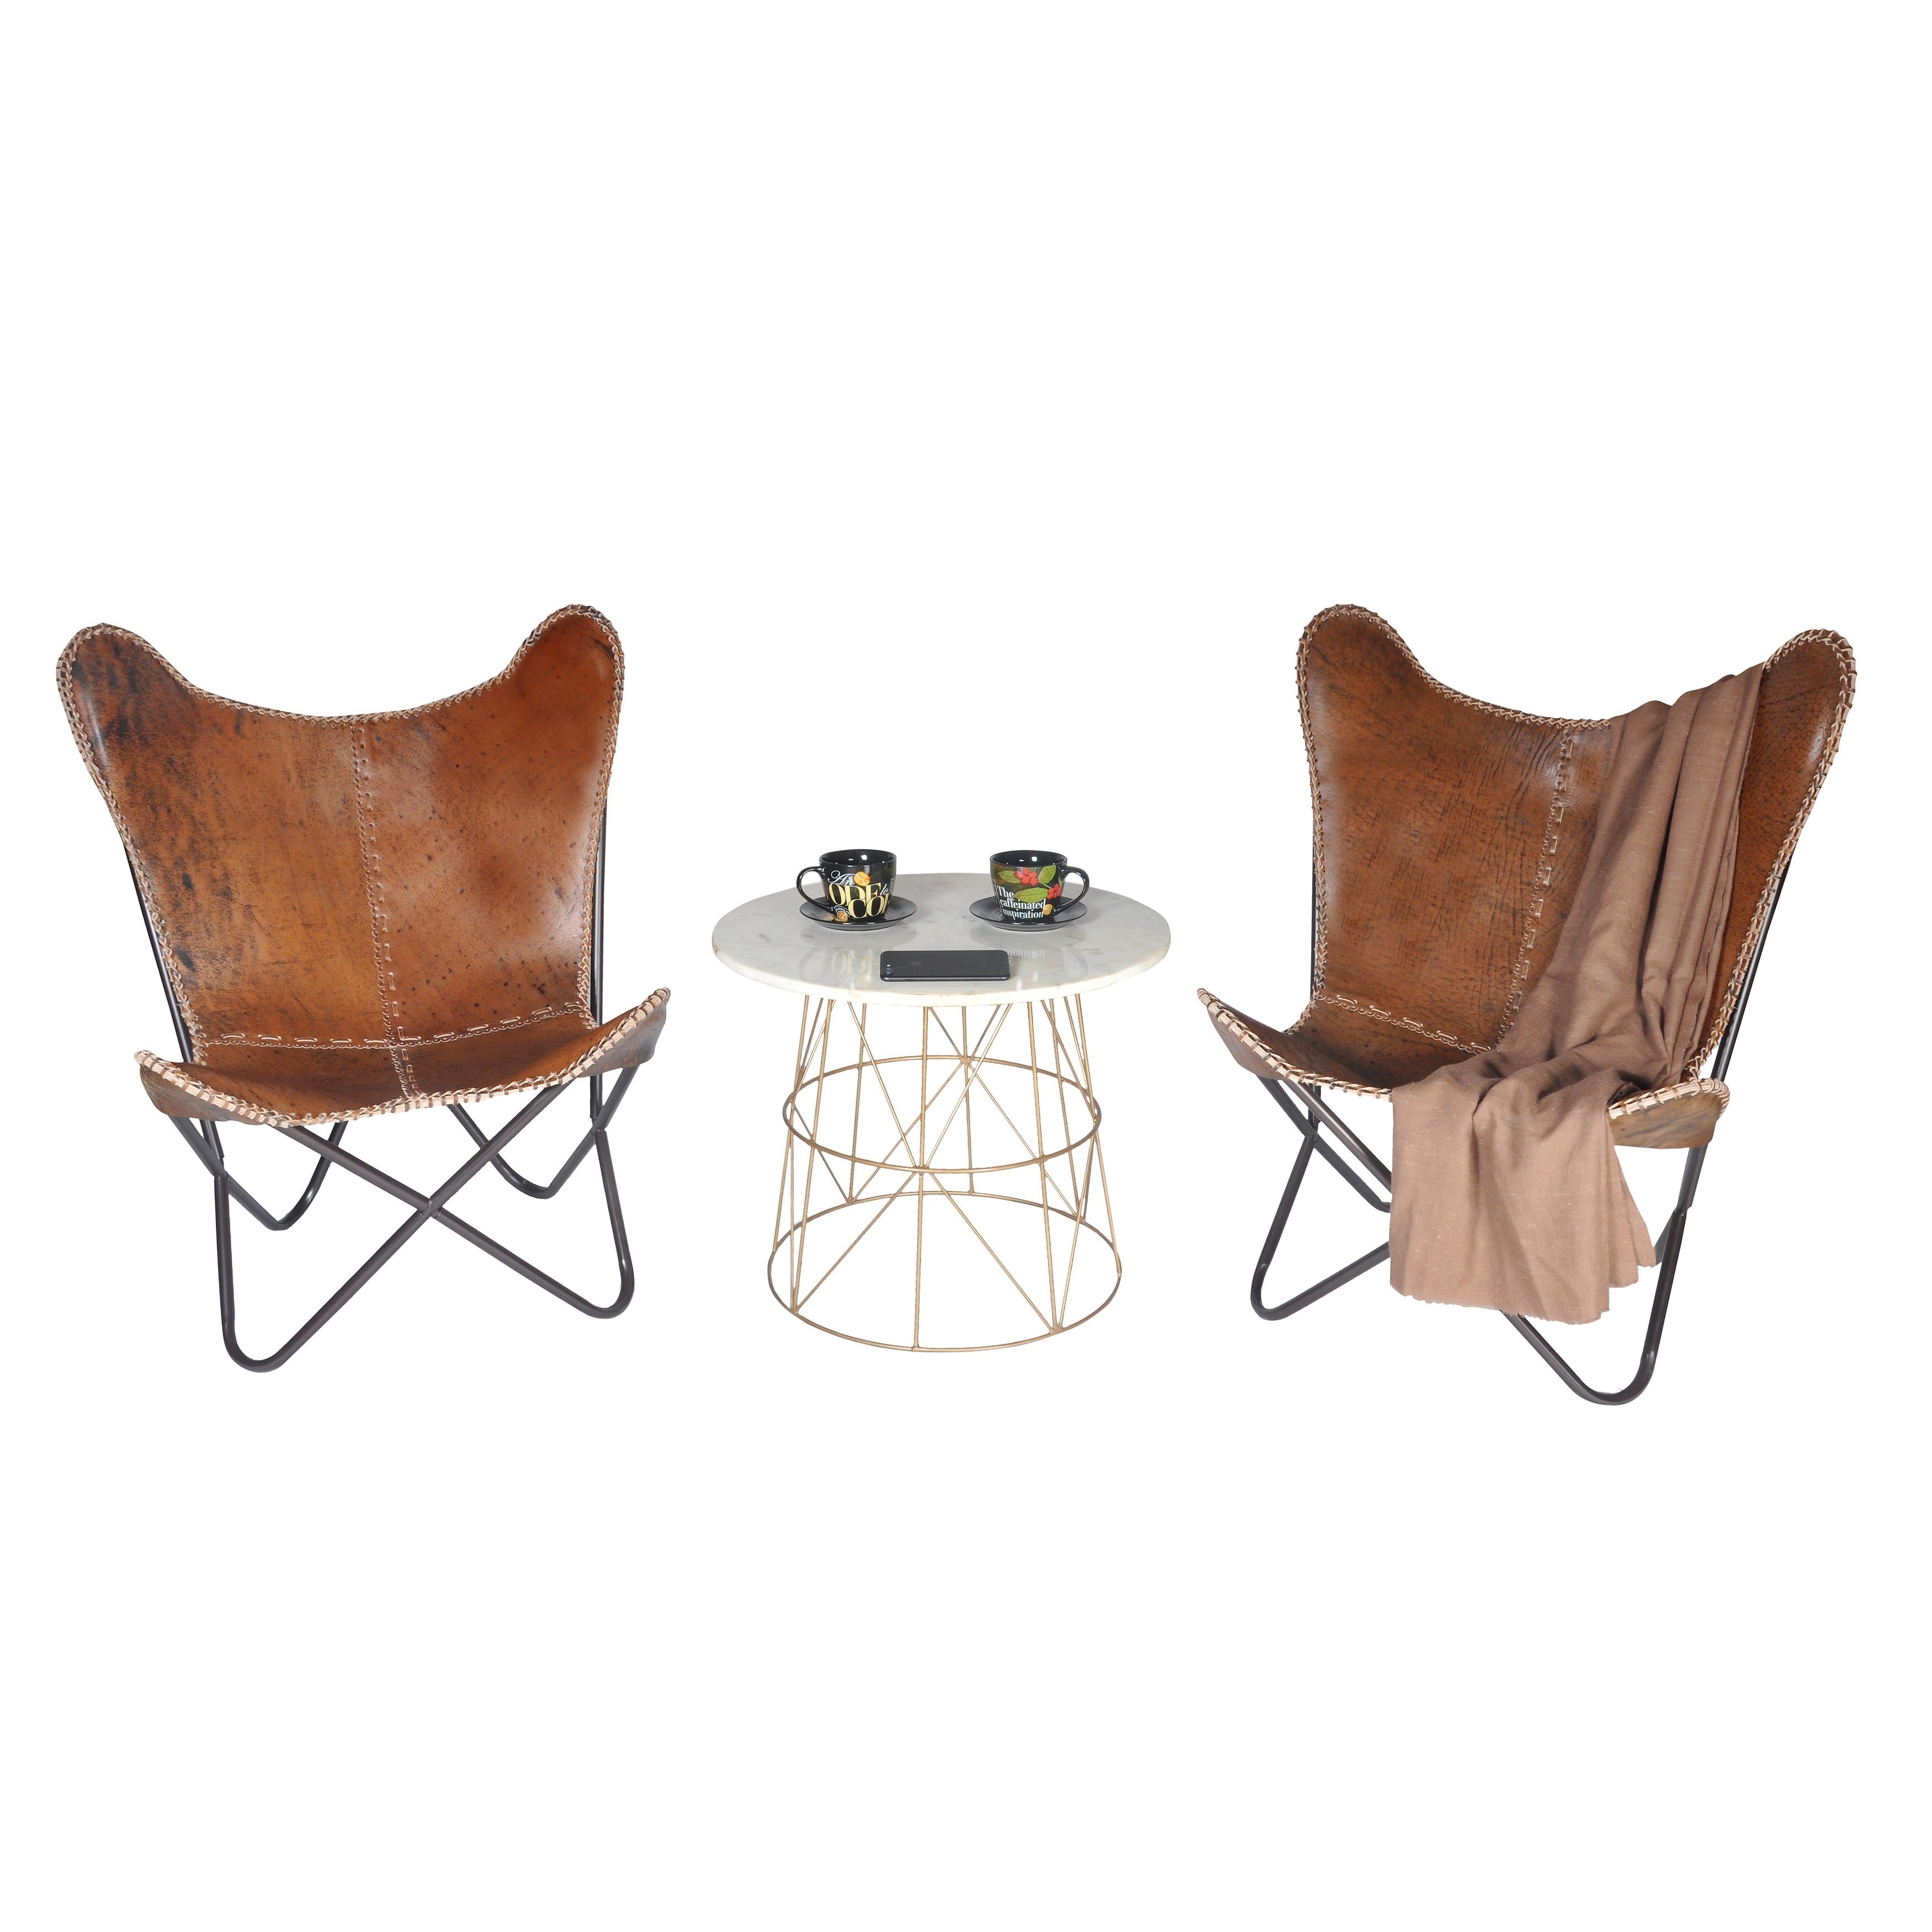 Carbon Loft Larkin Rustic Brown Leather Erfly Chair